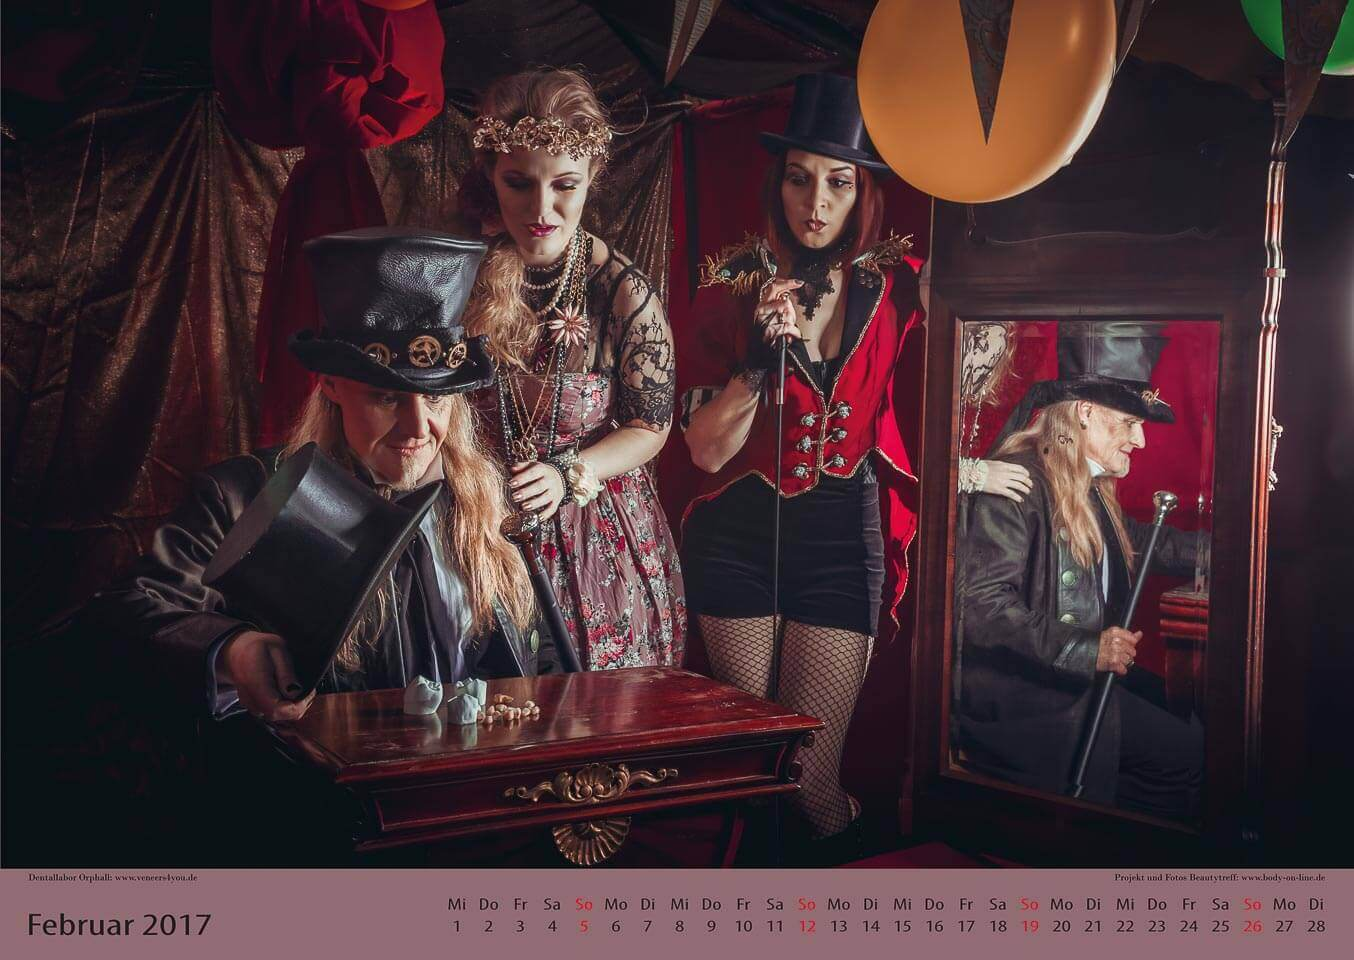 Fotograf-Fotostudio-Dresden-Zirkus-Shooting-Künstler-Artisten-Clown-Vorstellung-Zauberei-Styling-Make up-Unterhaltung